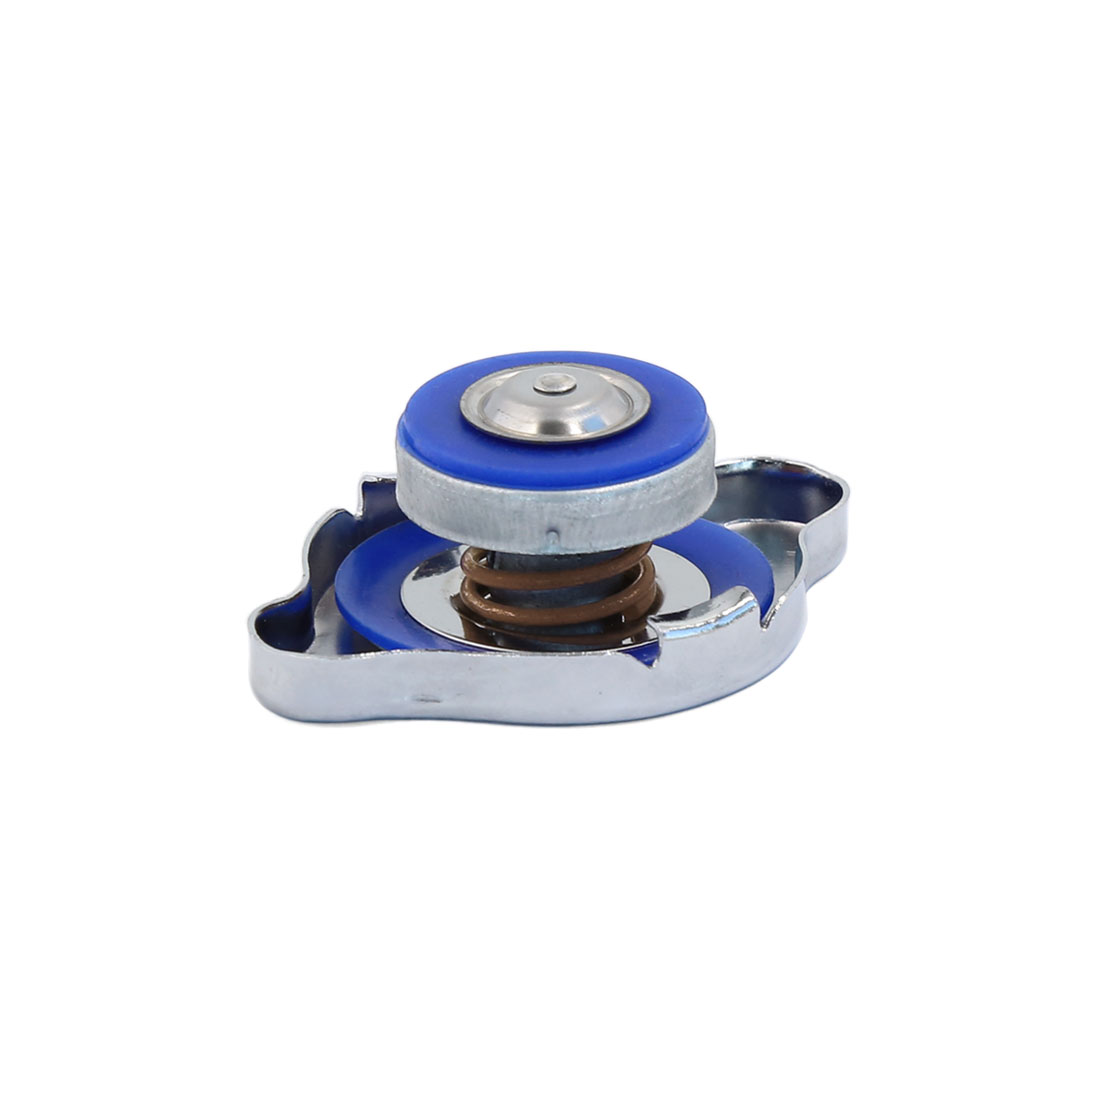 Car Metal Rubber Titanium Style Performance Radiator Cap Protector 1.1 Kg/cm2